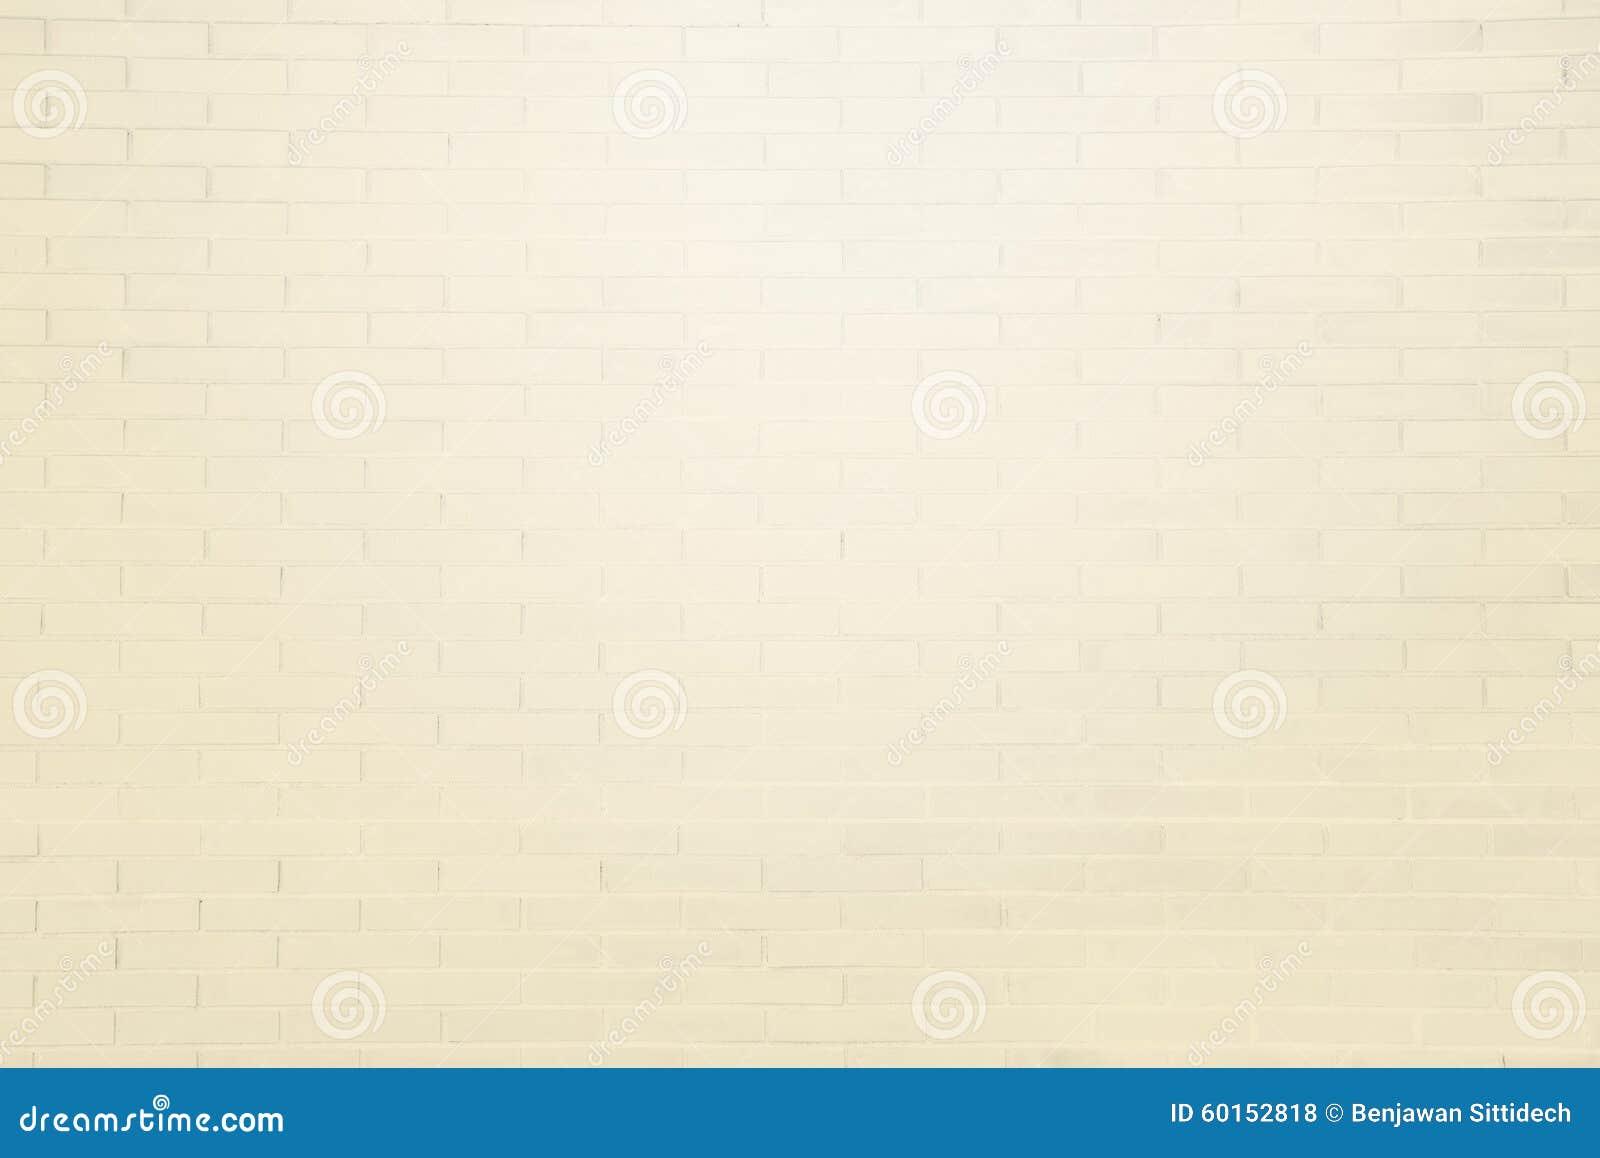 Light Beige Grunge Brick Wall Texture Background Stock